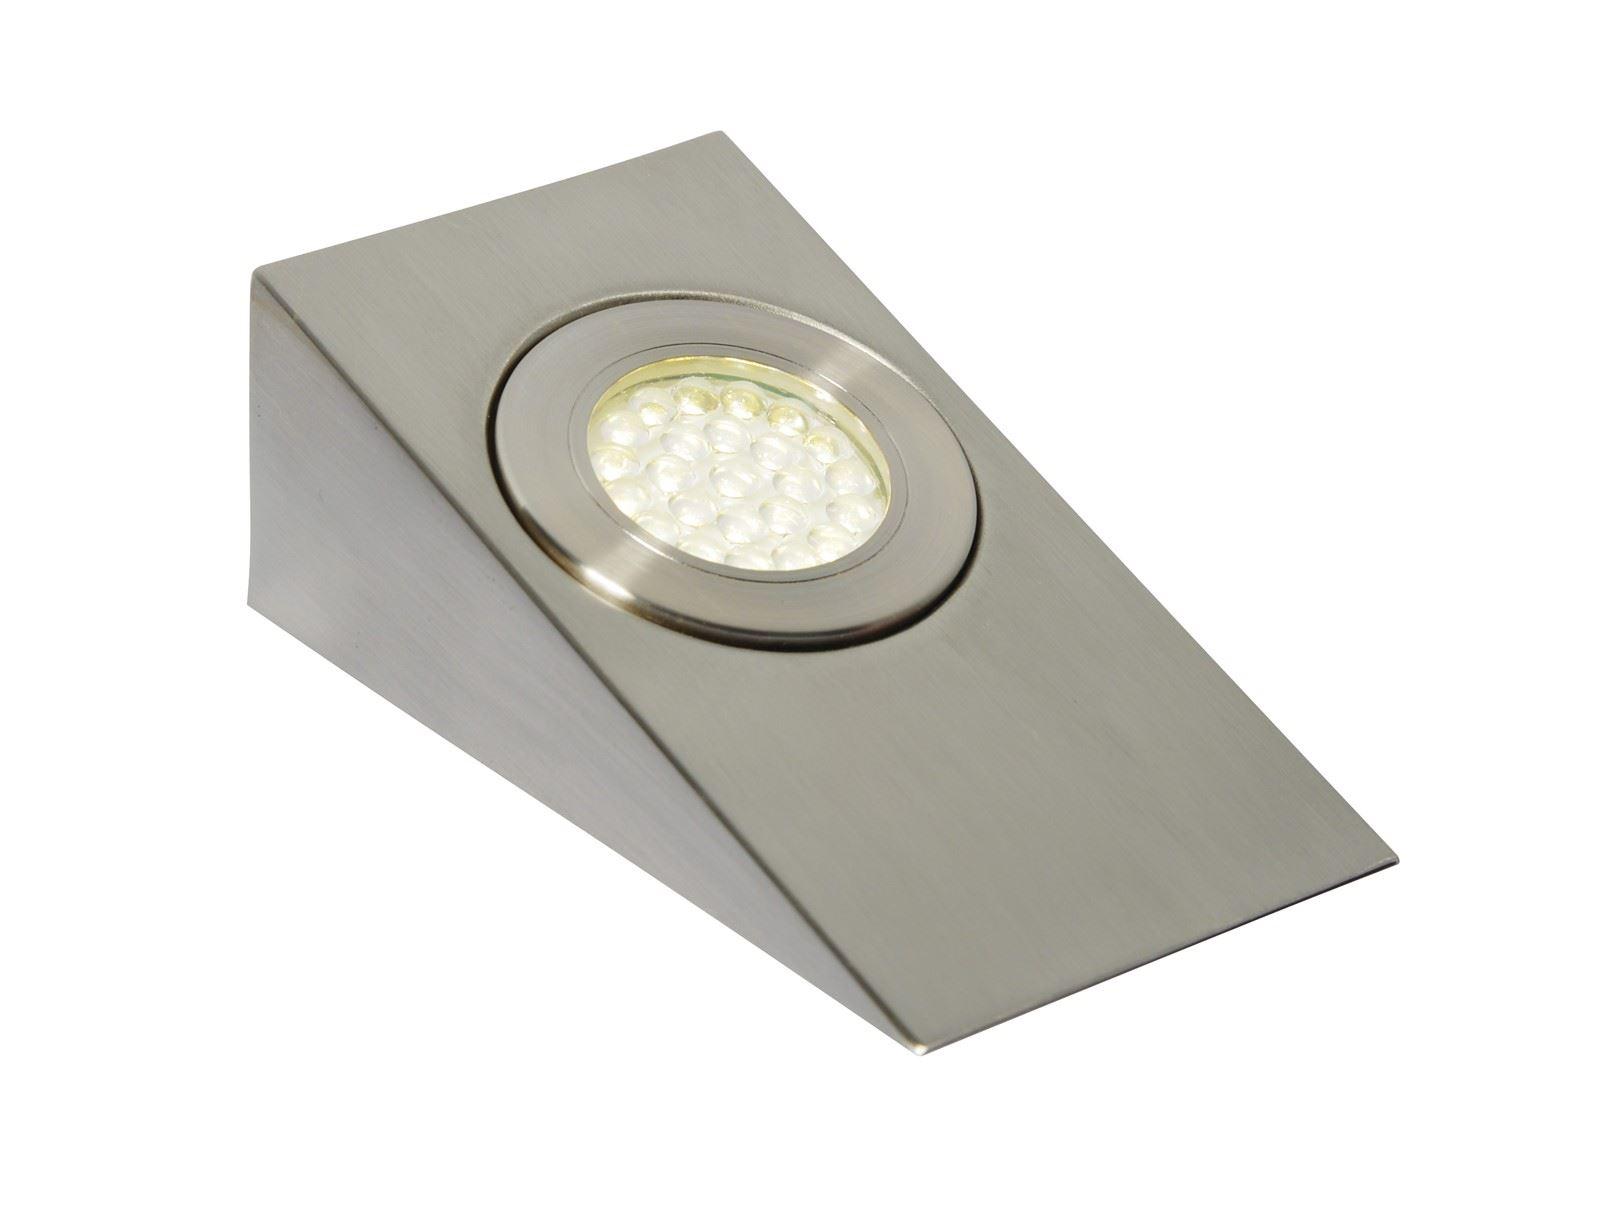 Lago Led, Mains Voltage, Wedge Cabinet Light, 6000K Day Light